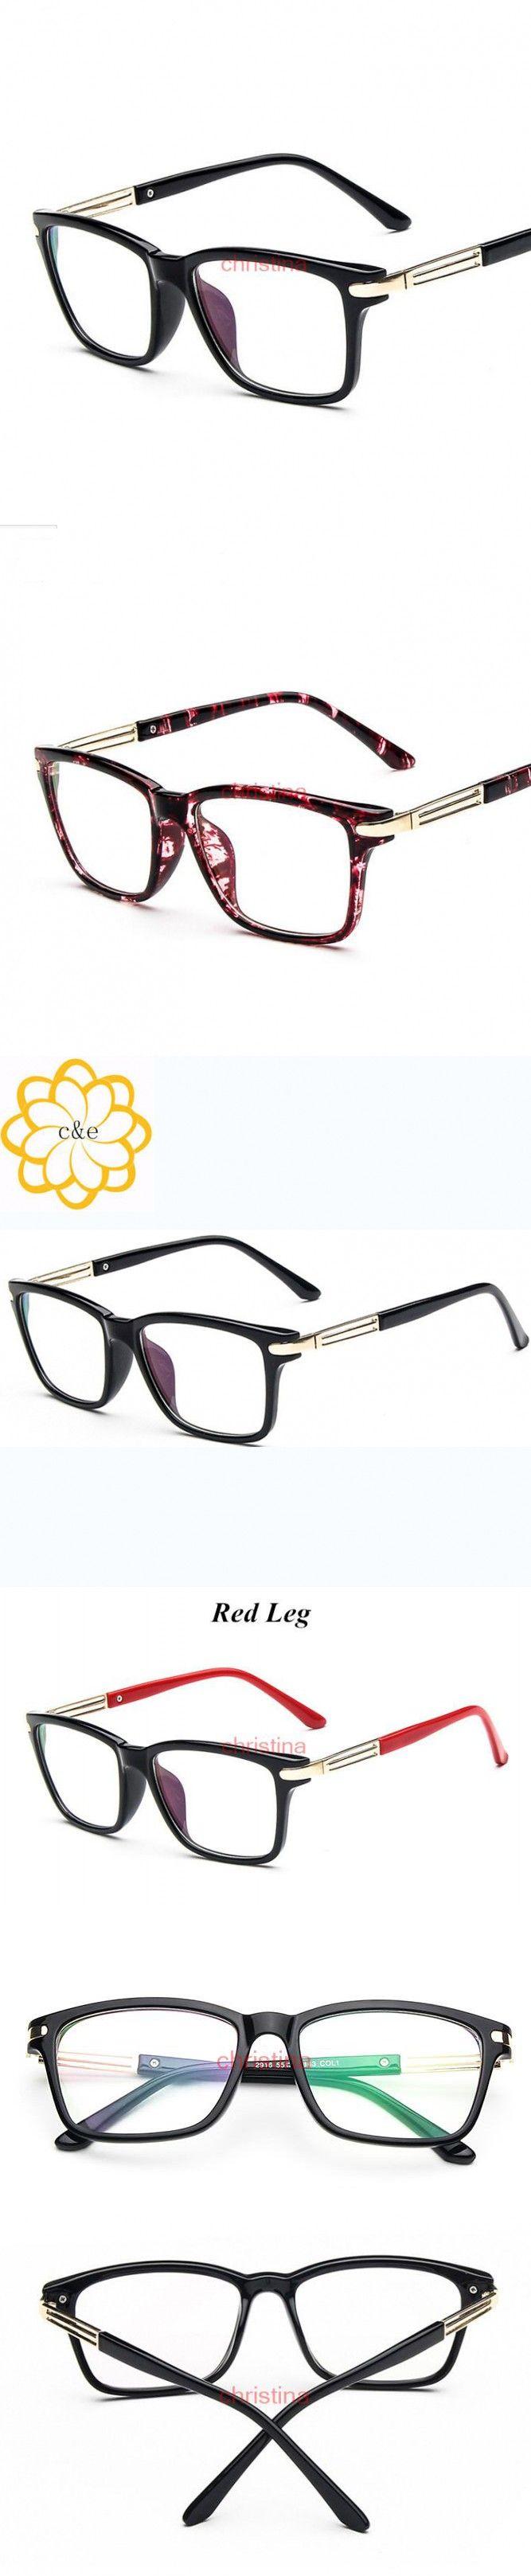 Fashion Eyeglasses For Women Clear Lens Plain prescription Eyewear Glasses Square Frame Lentes Opticos oculos de grau femininos $10.57